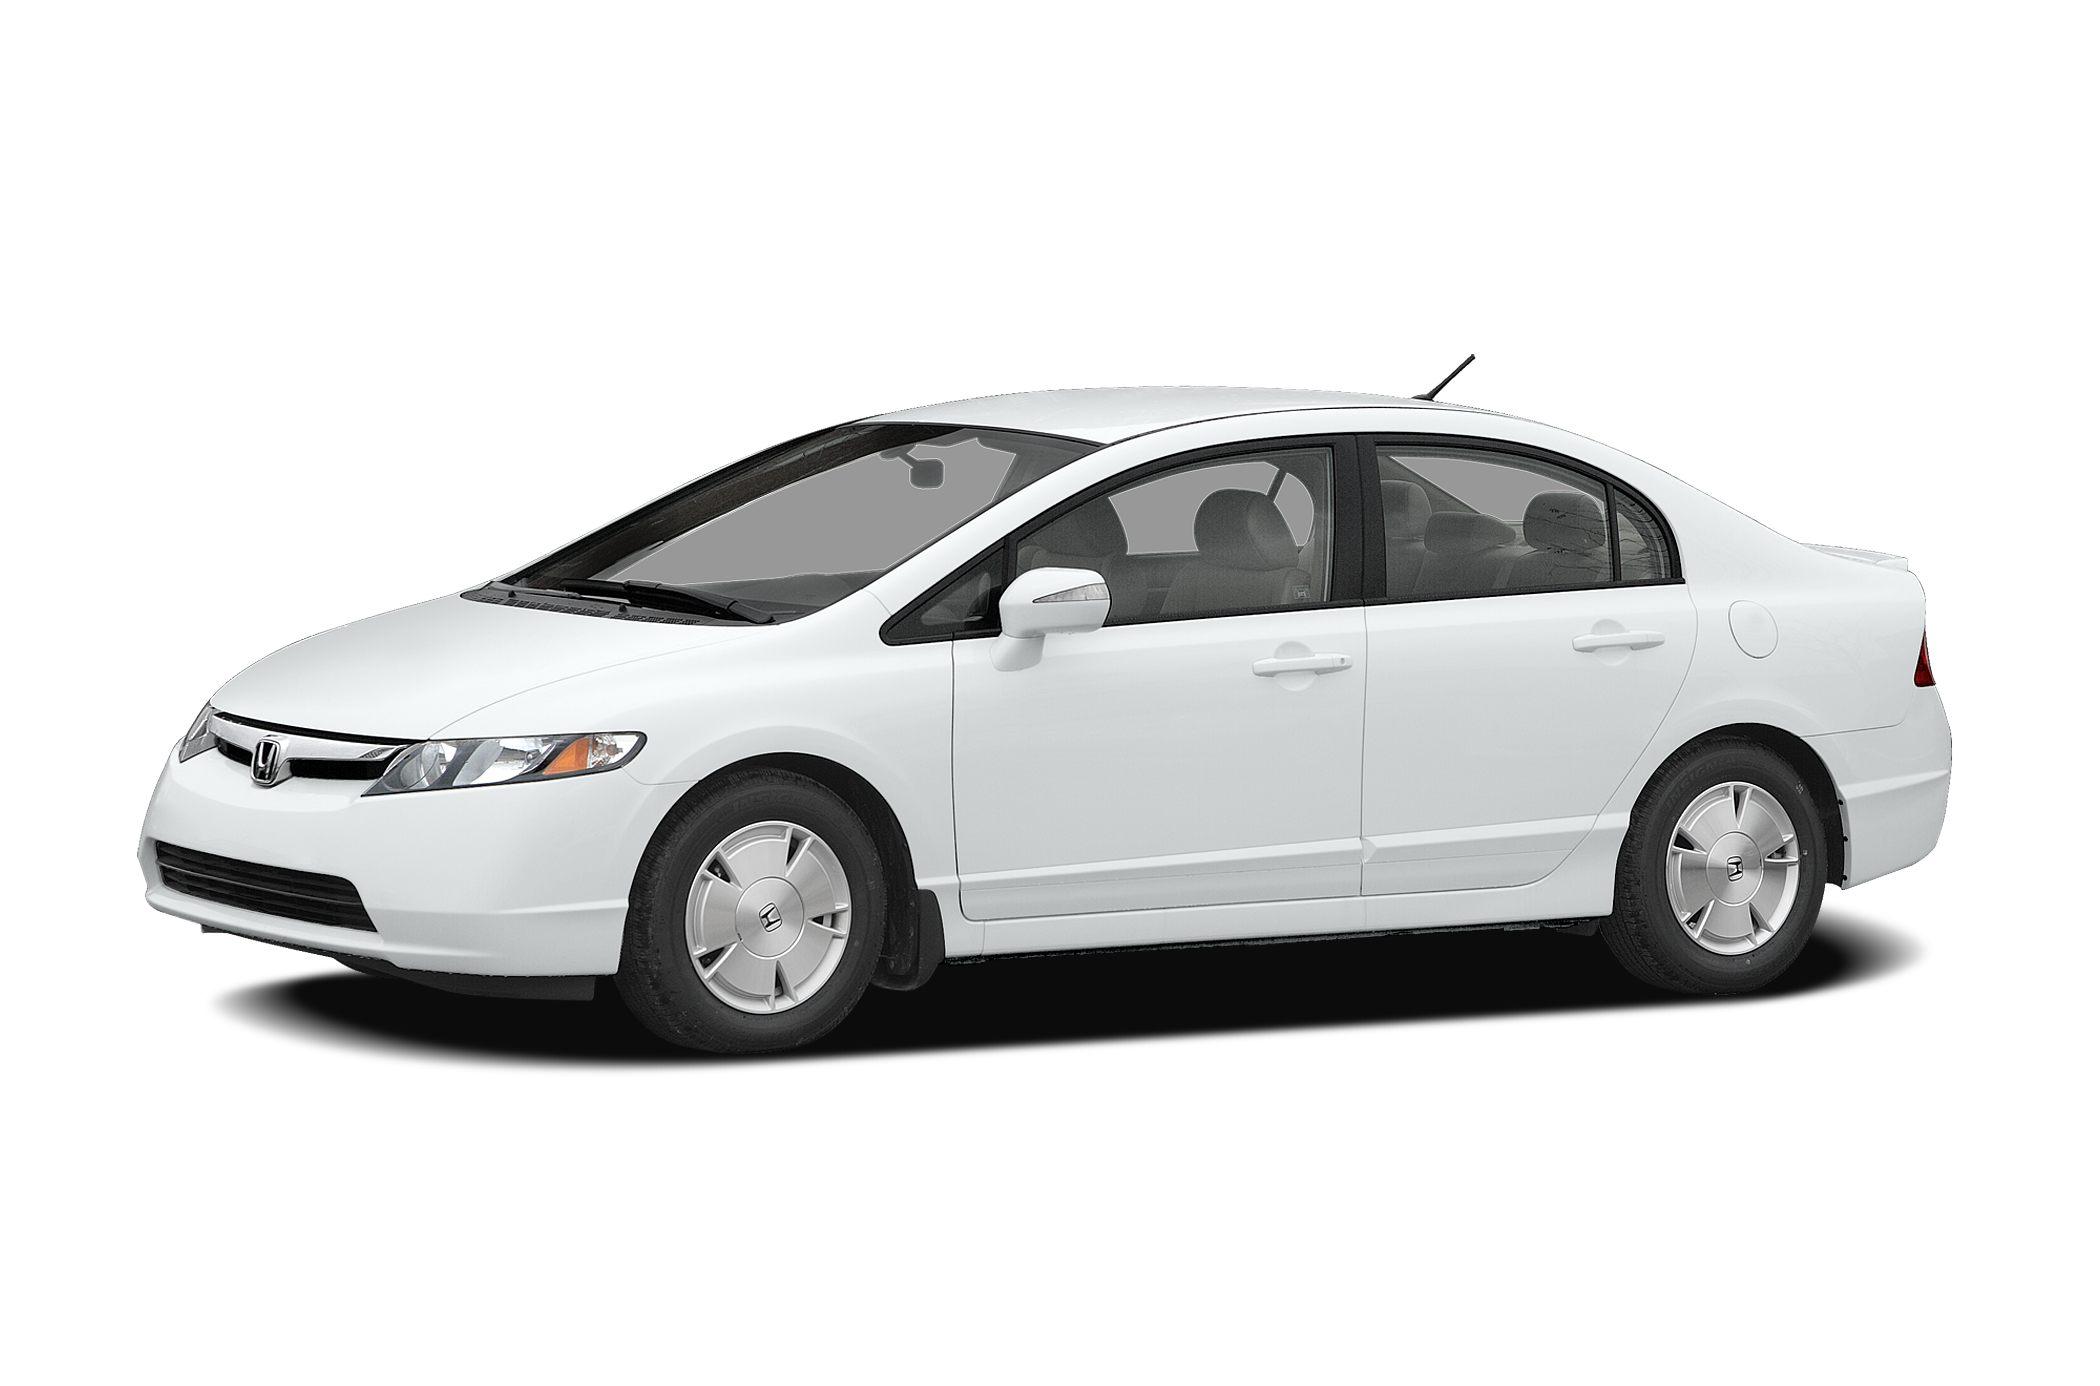 2006 Honda Civic Hybrid Sedan for sale in Houston for $8,991 with 107,443 miles